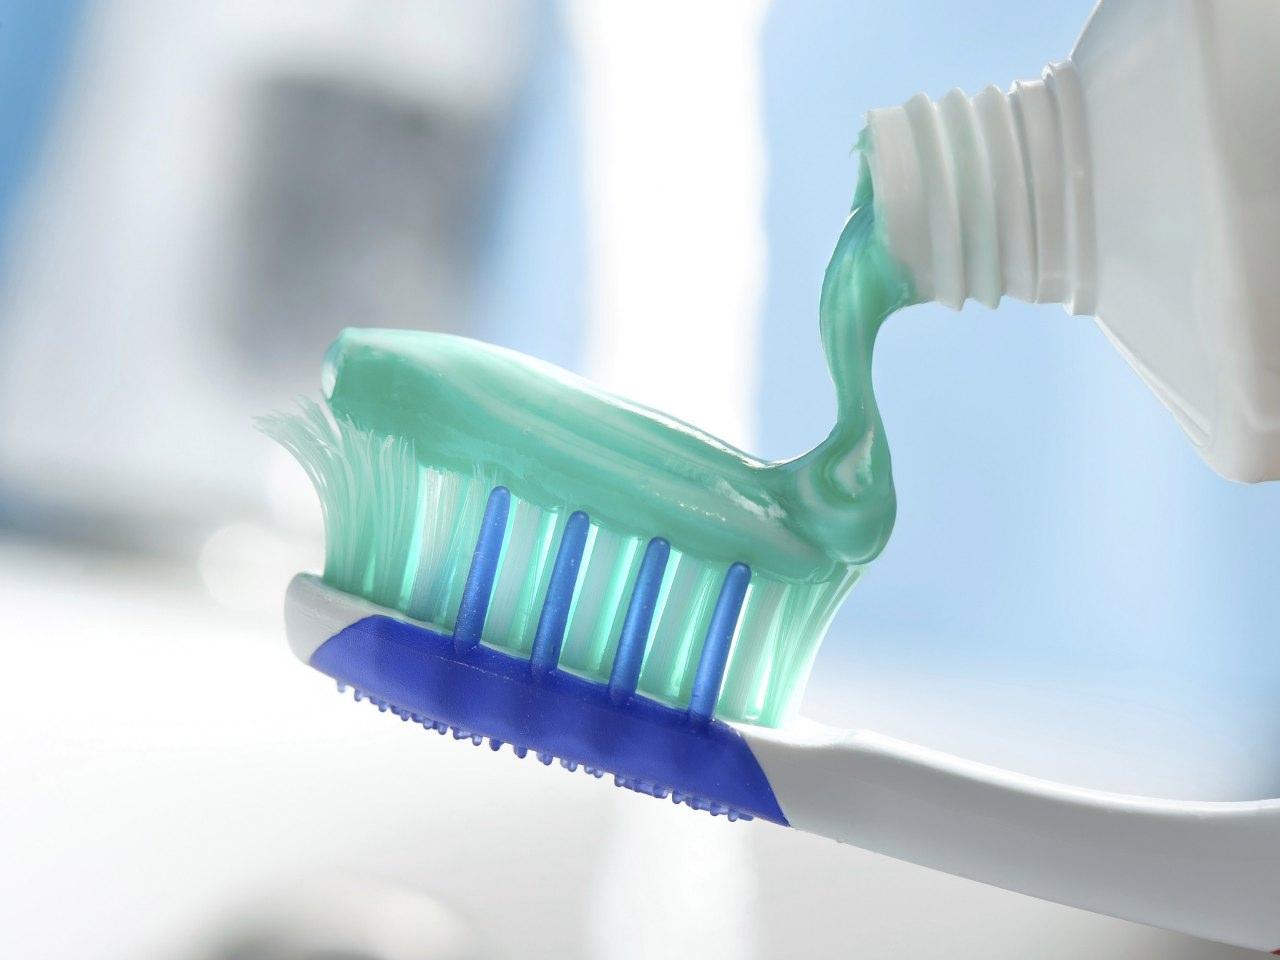 Fluoride Bloink Dental Topical Application Of Fluoride